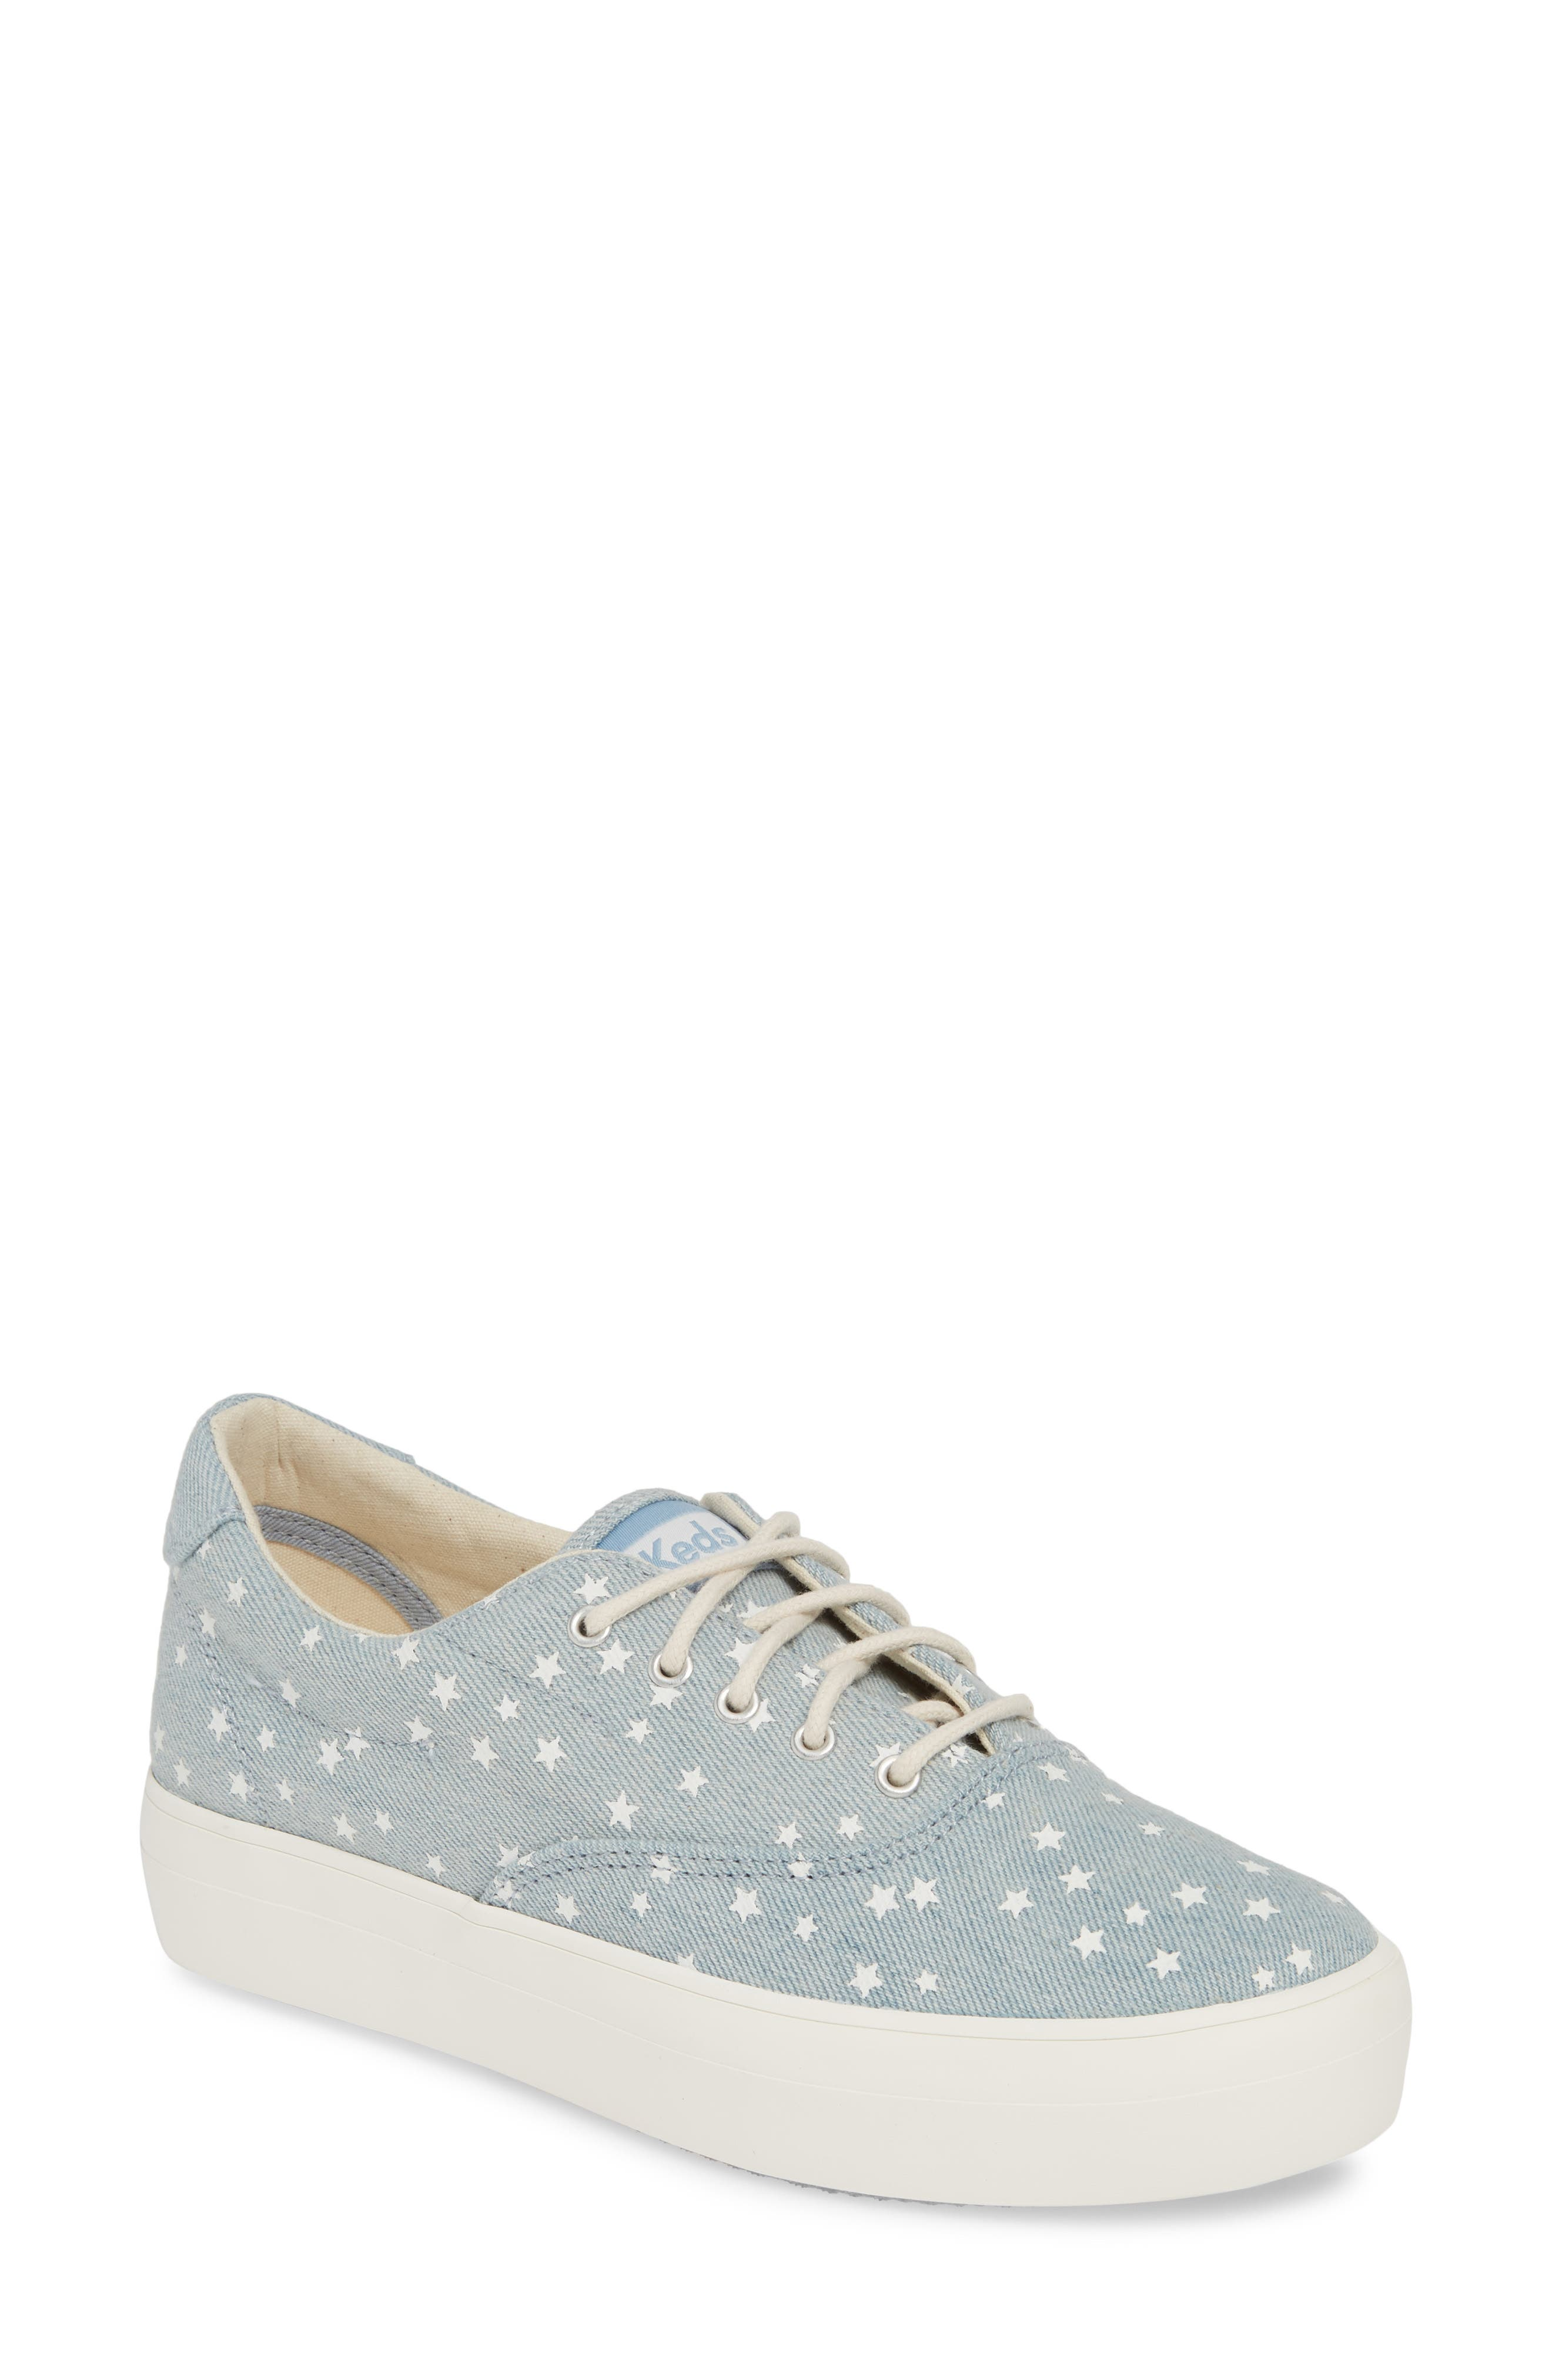 KEDS<SUP>®</SUP> Rise Denim Star Sneaker, Main, color, LIGHT BLUE